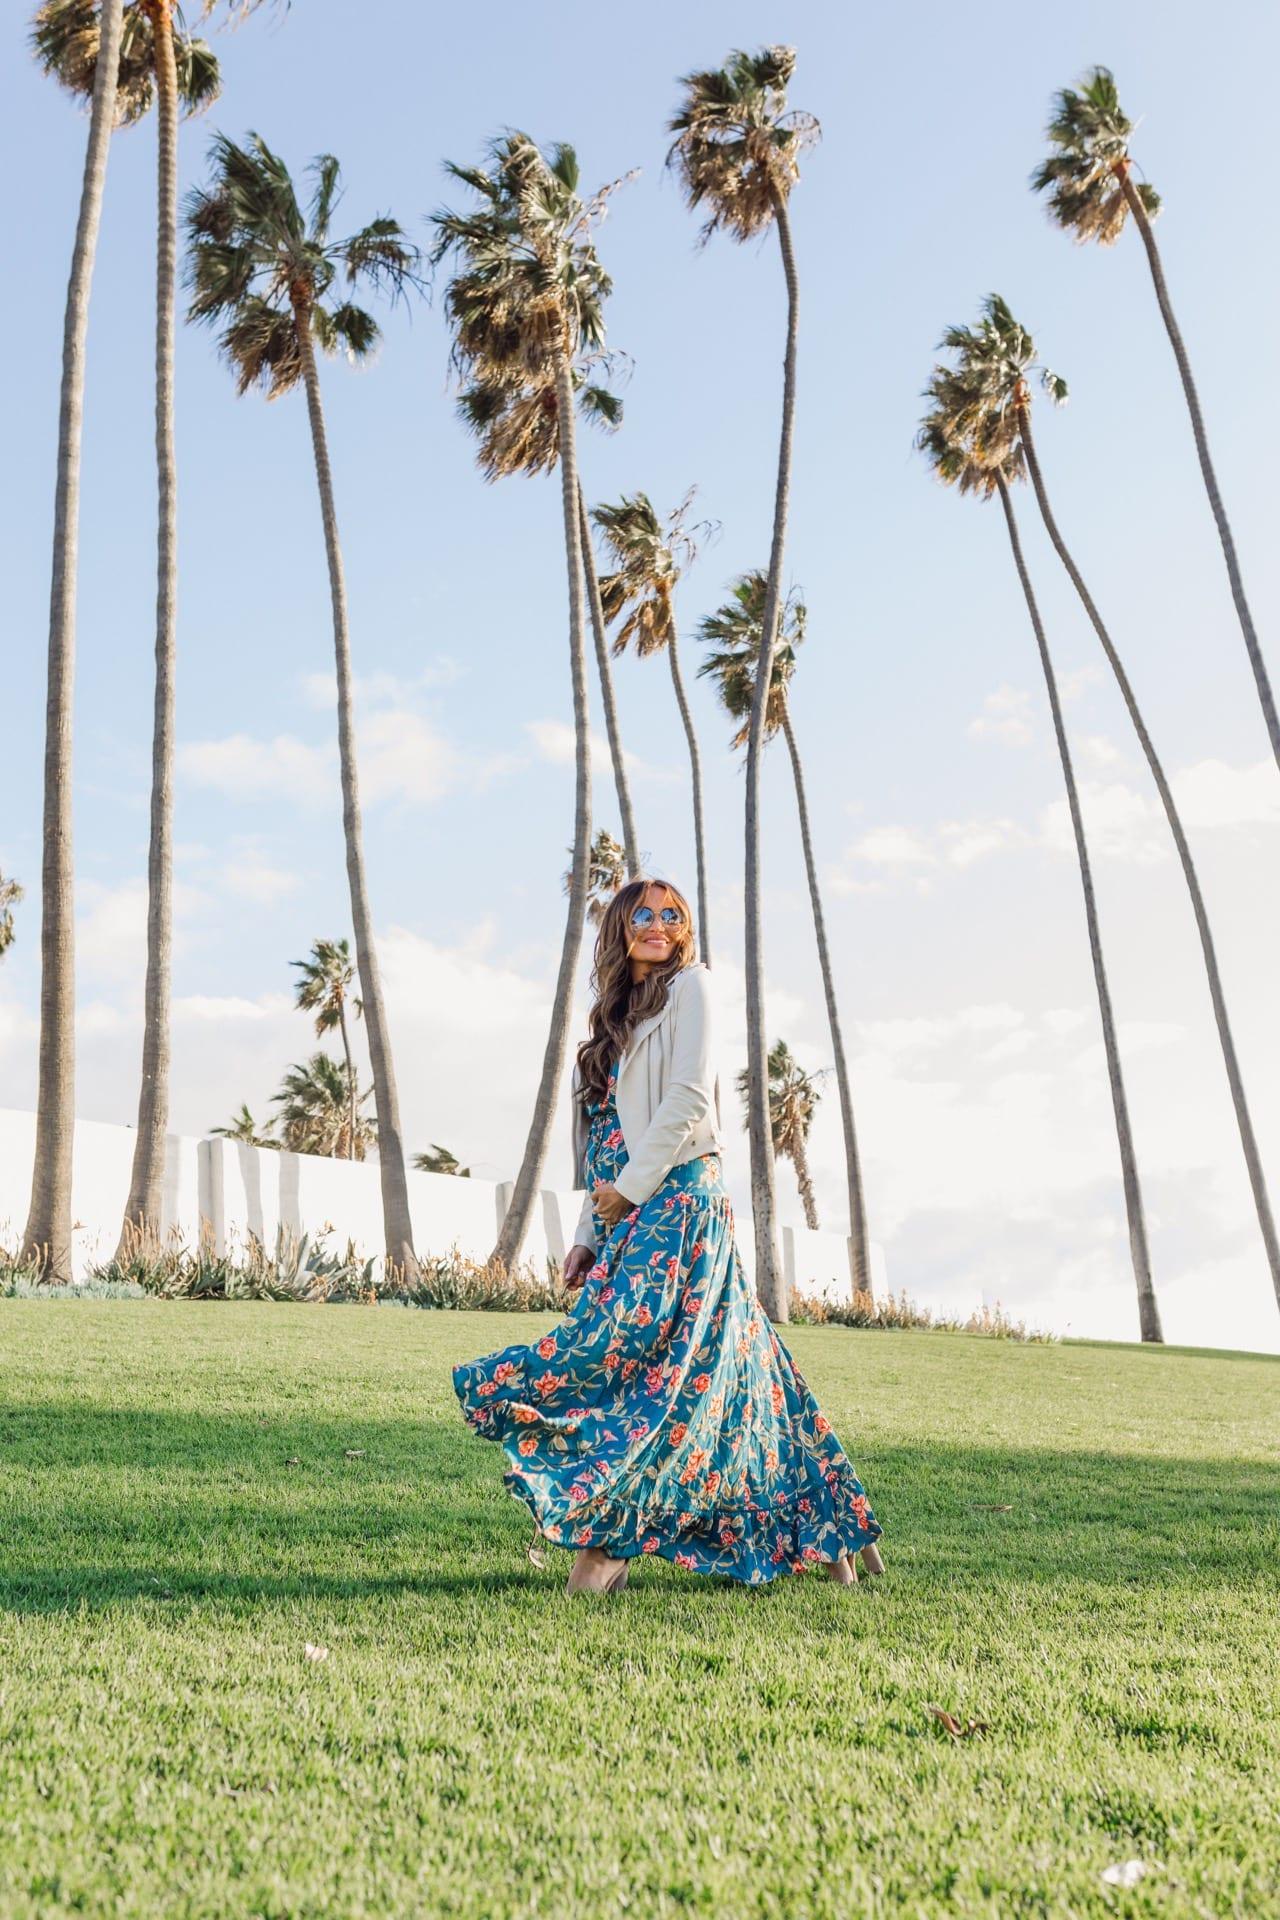 #DKW-Fashion 03-21-2019 Dress by KIVARI